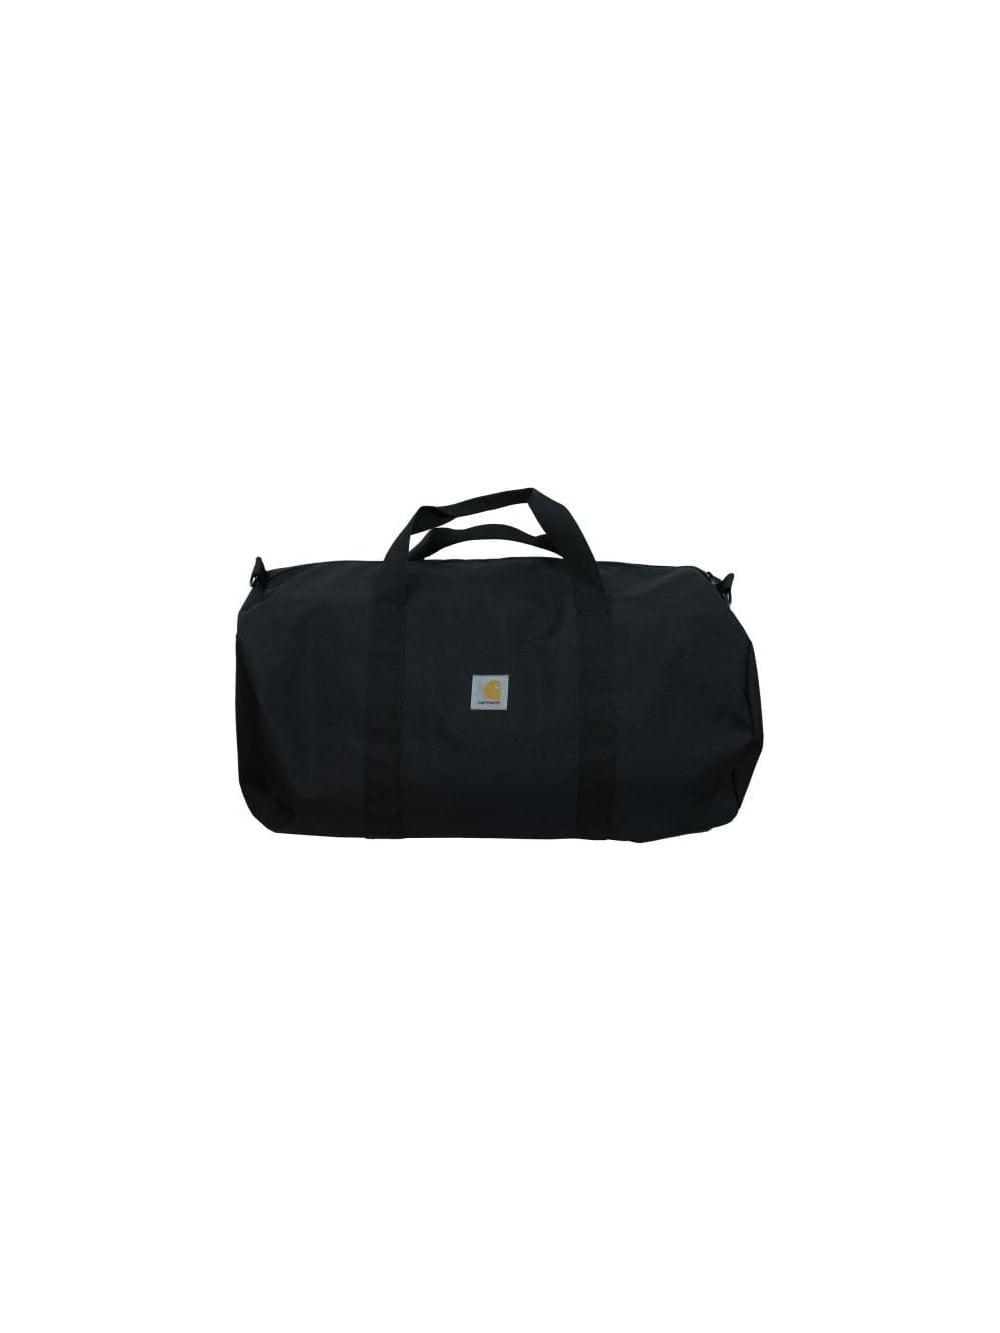 dc3d0b742b40 Carhartt Duffle Bag in Black - Northern Threads